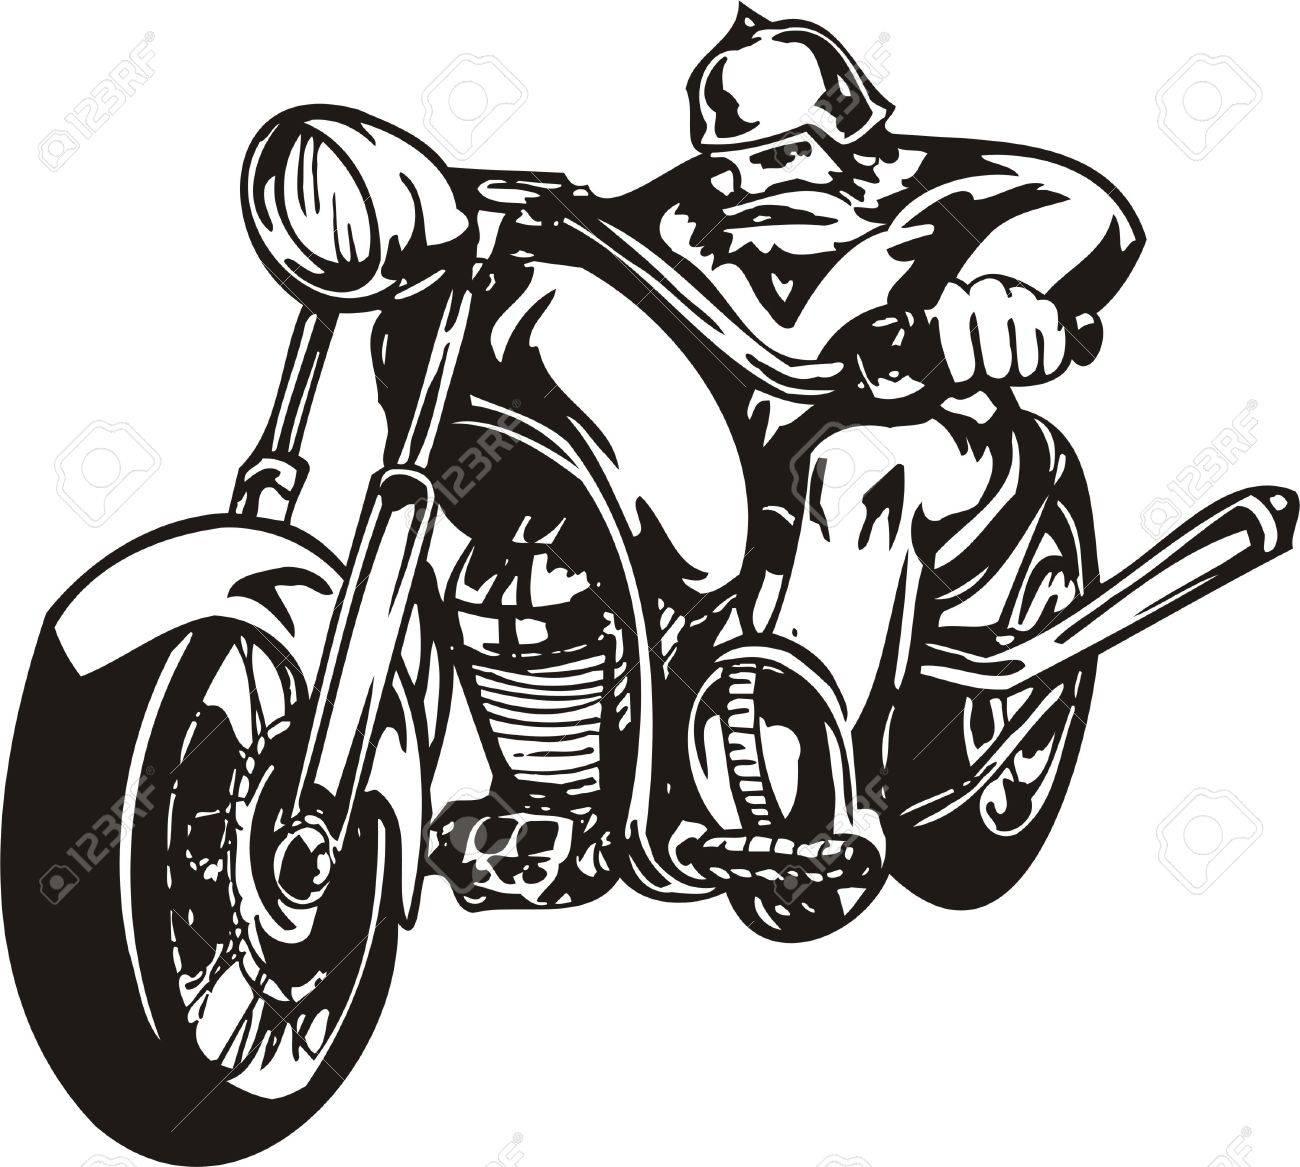 Biker on Motorcycle. Vector Illustration. Stock Vector - 8777347